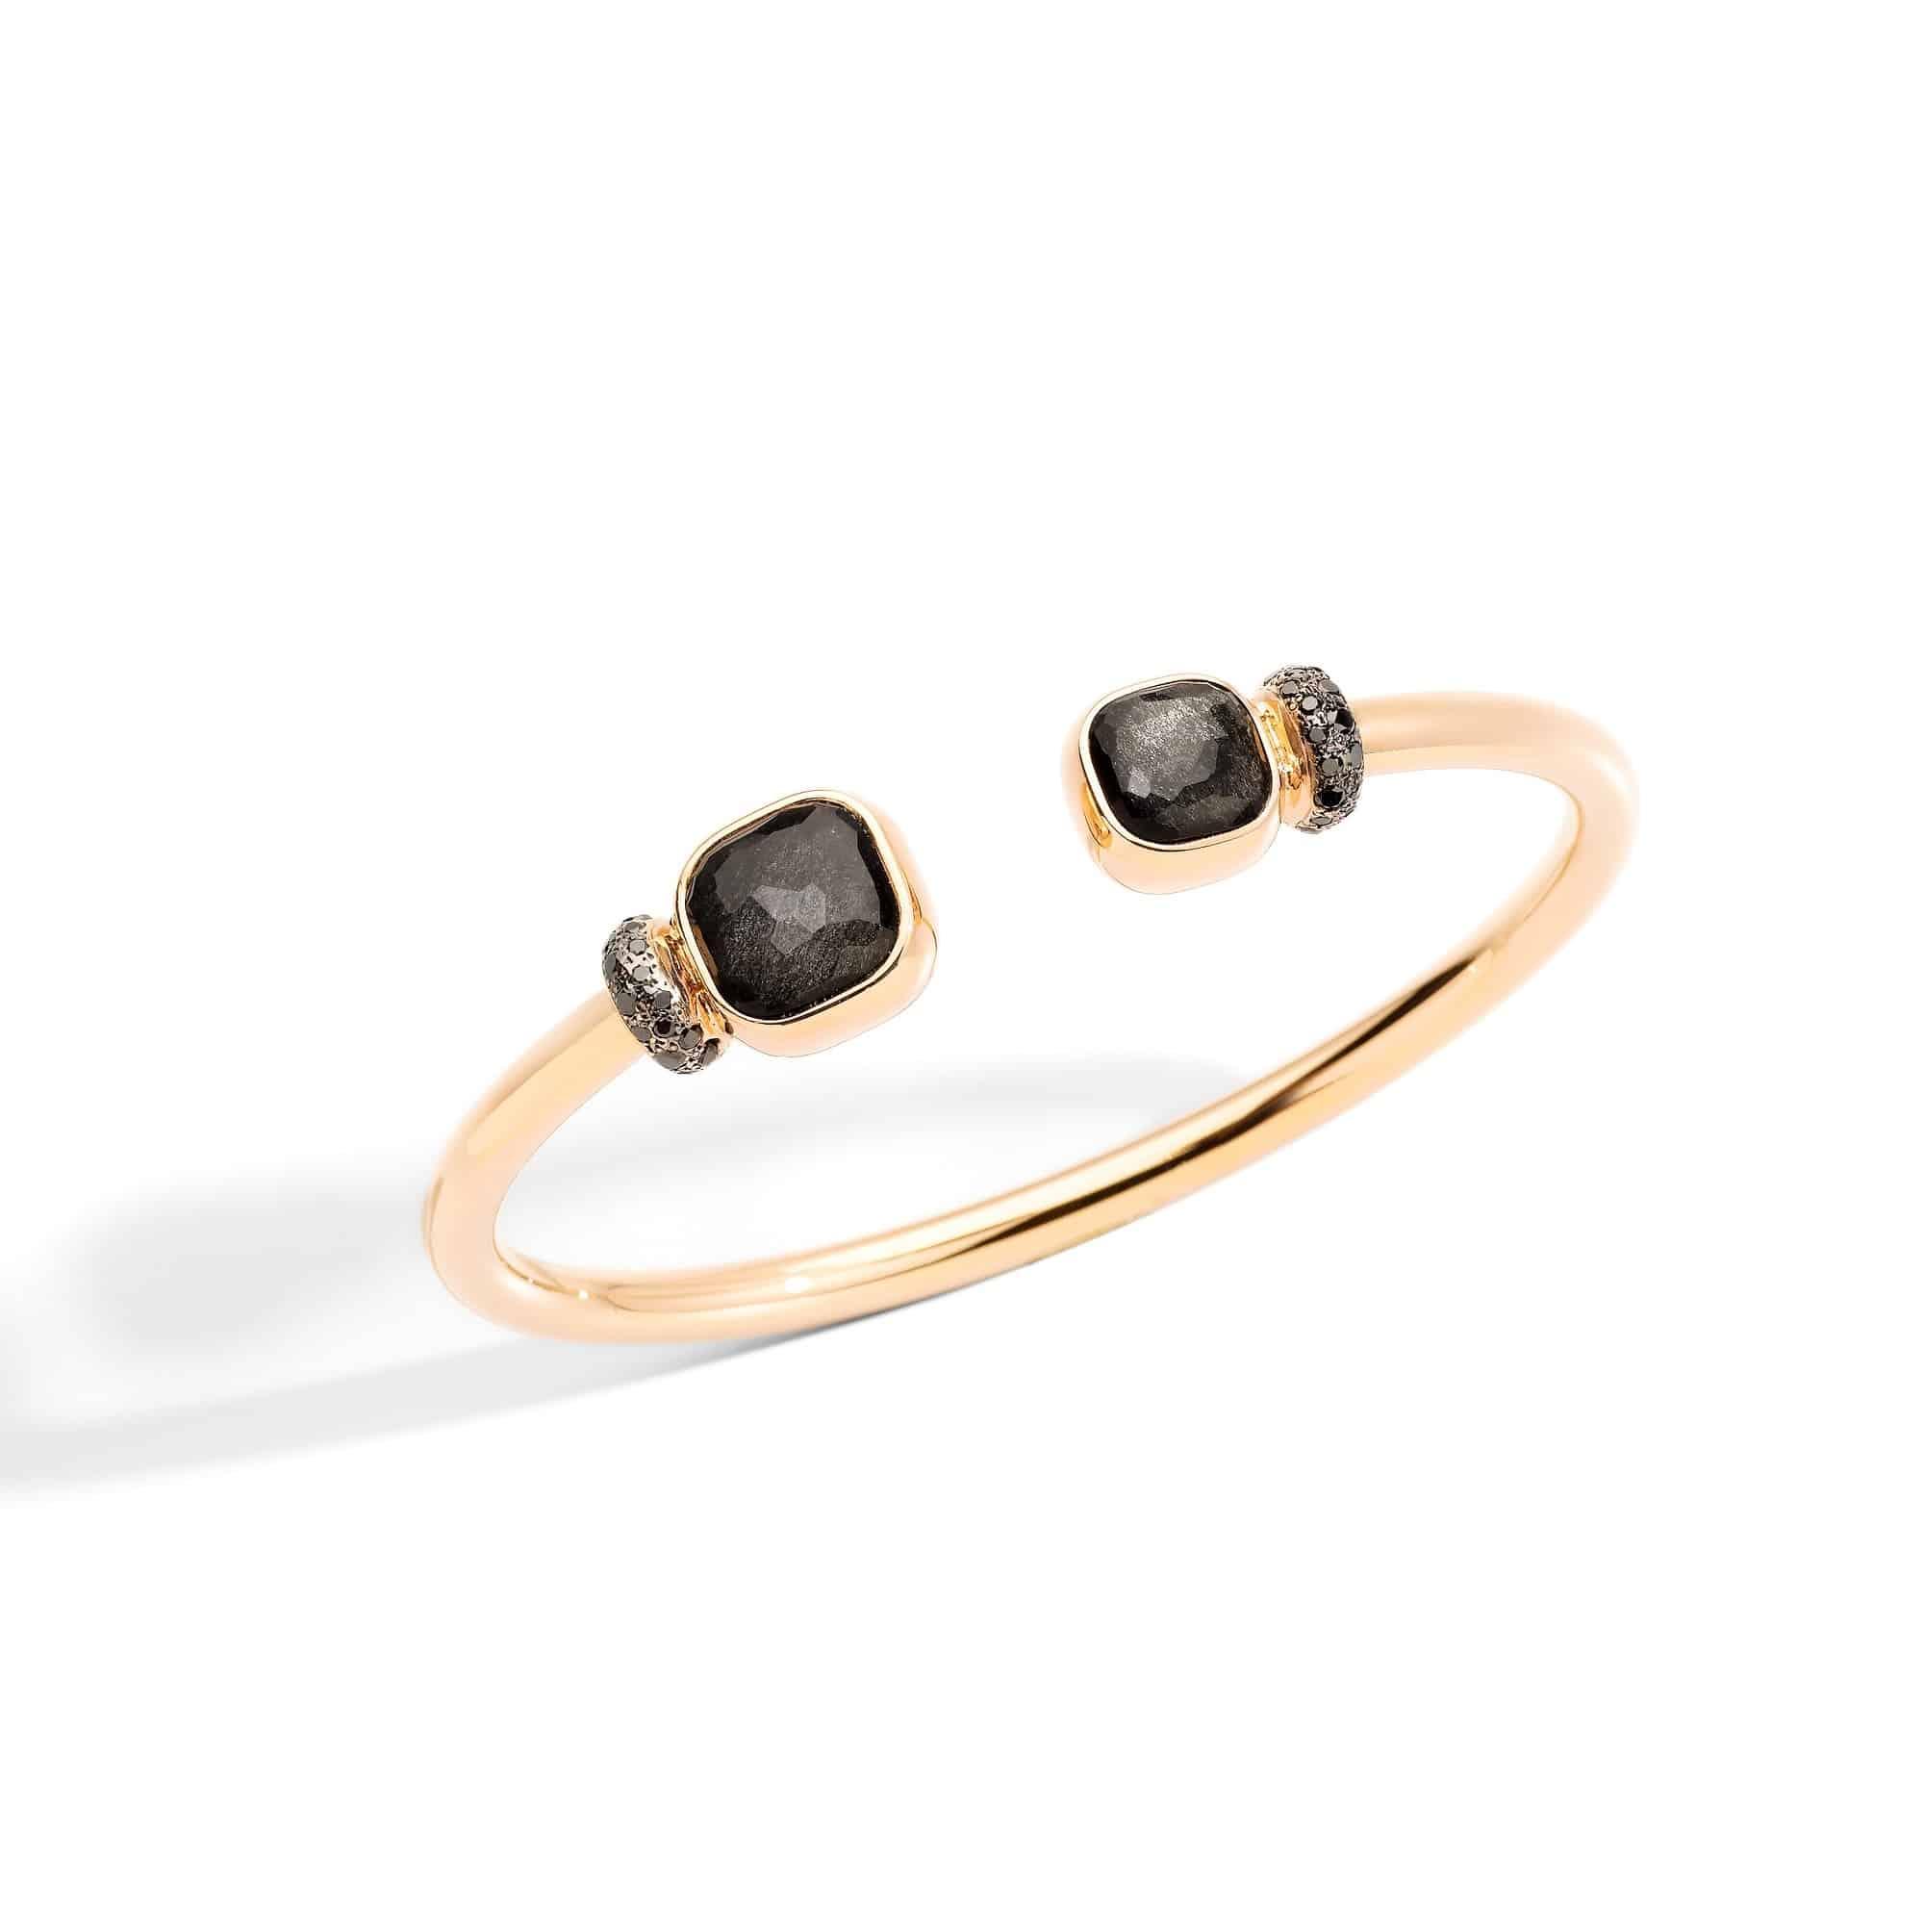 Pomellato Nudo Armreif aus Roségold mit Obsidian und schwarzen Diamanten